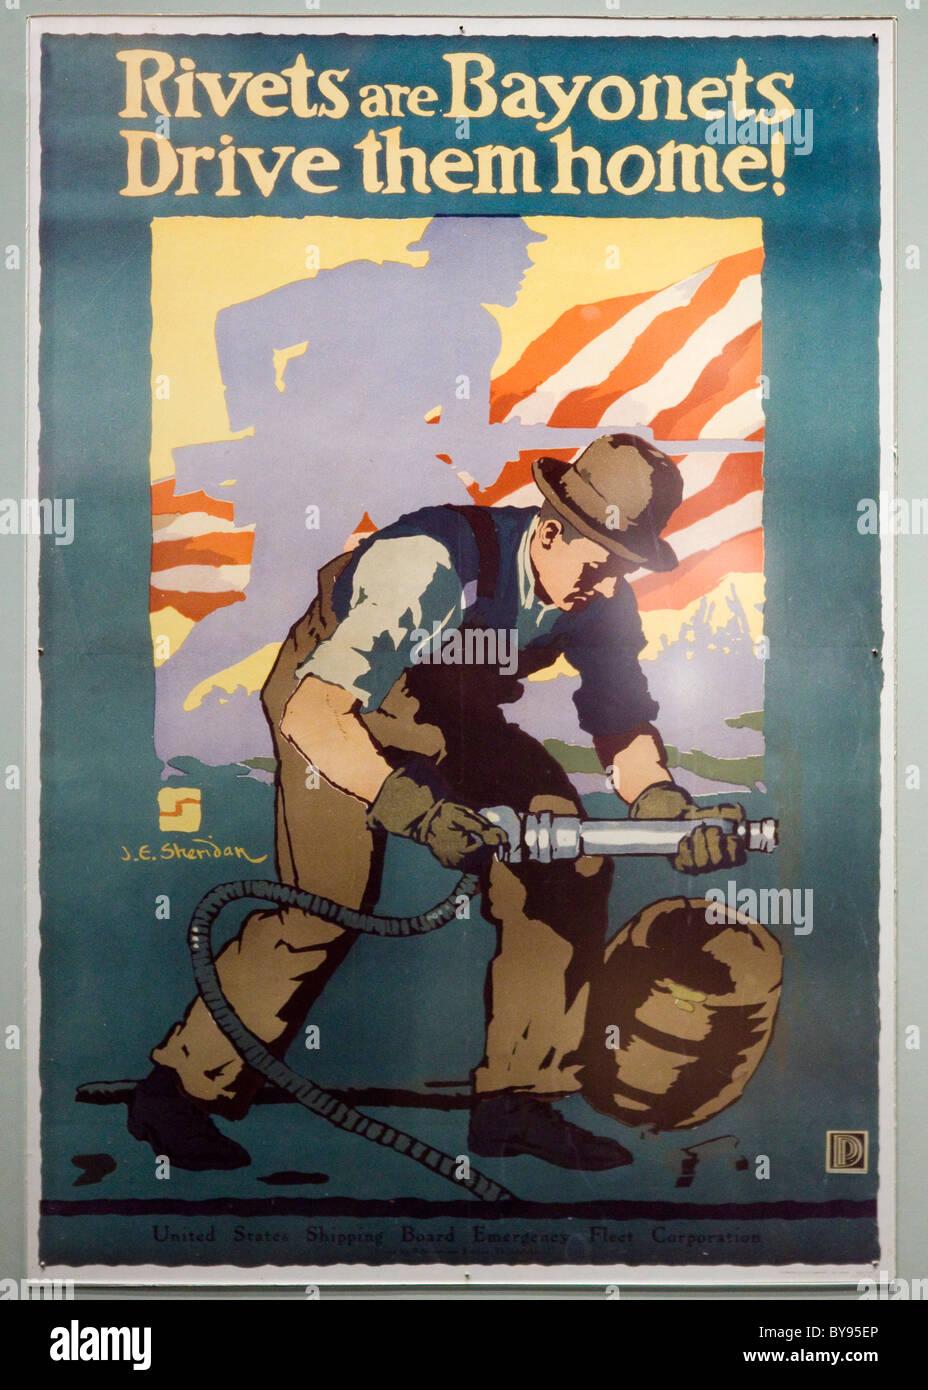 US Shipping Board Emergency Fleet Corporation poster - USA - Stock Image